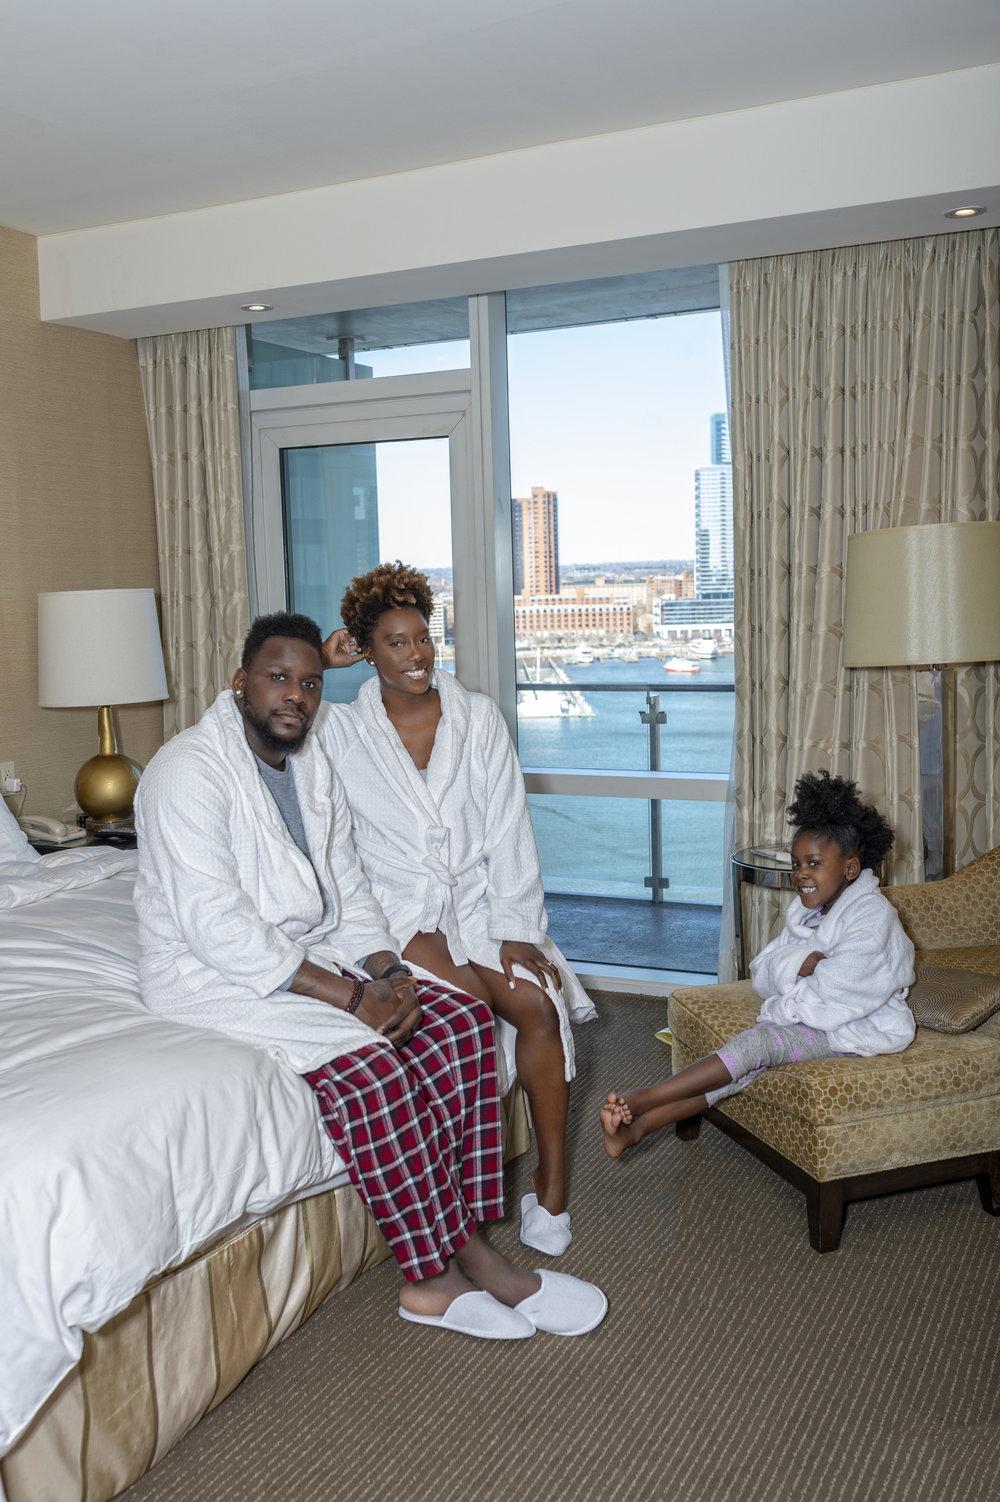 Four-Seasons-Baltimore-Family-Staycation-Dayna_bolden-family.jpg